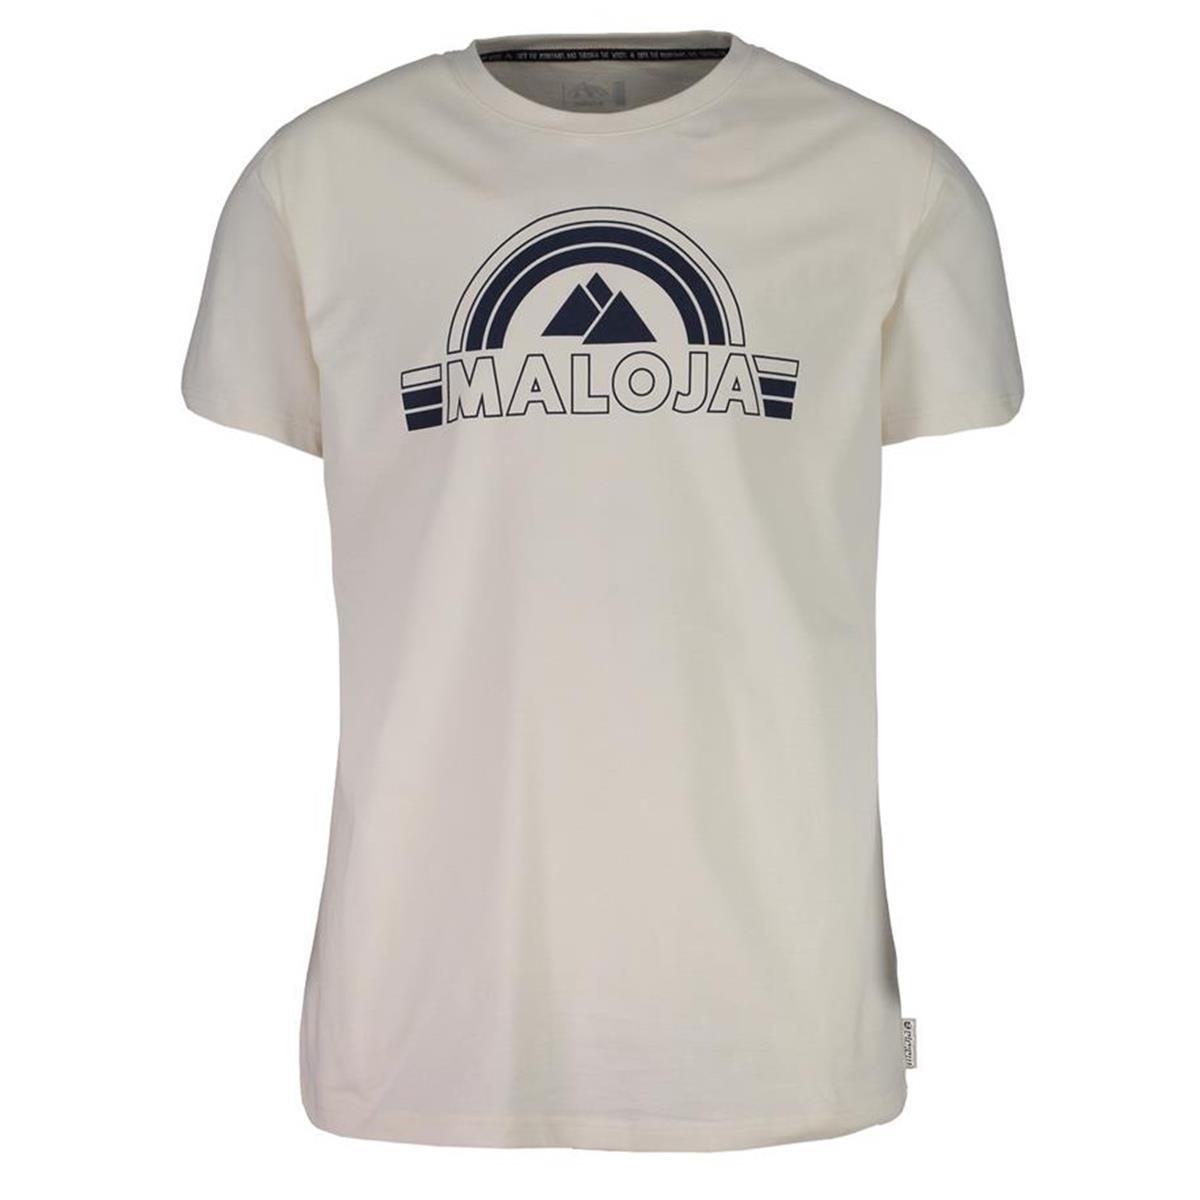 Maloja T-Shirt SparselsM. Vintage White